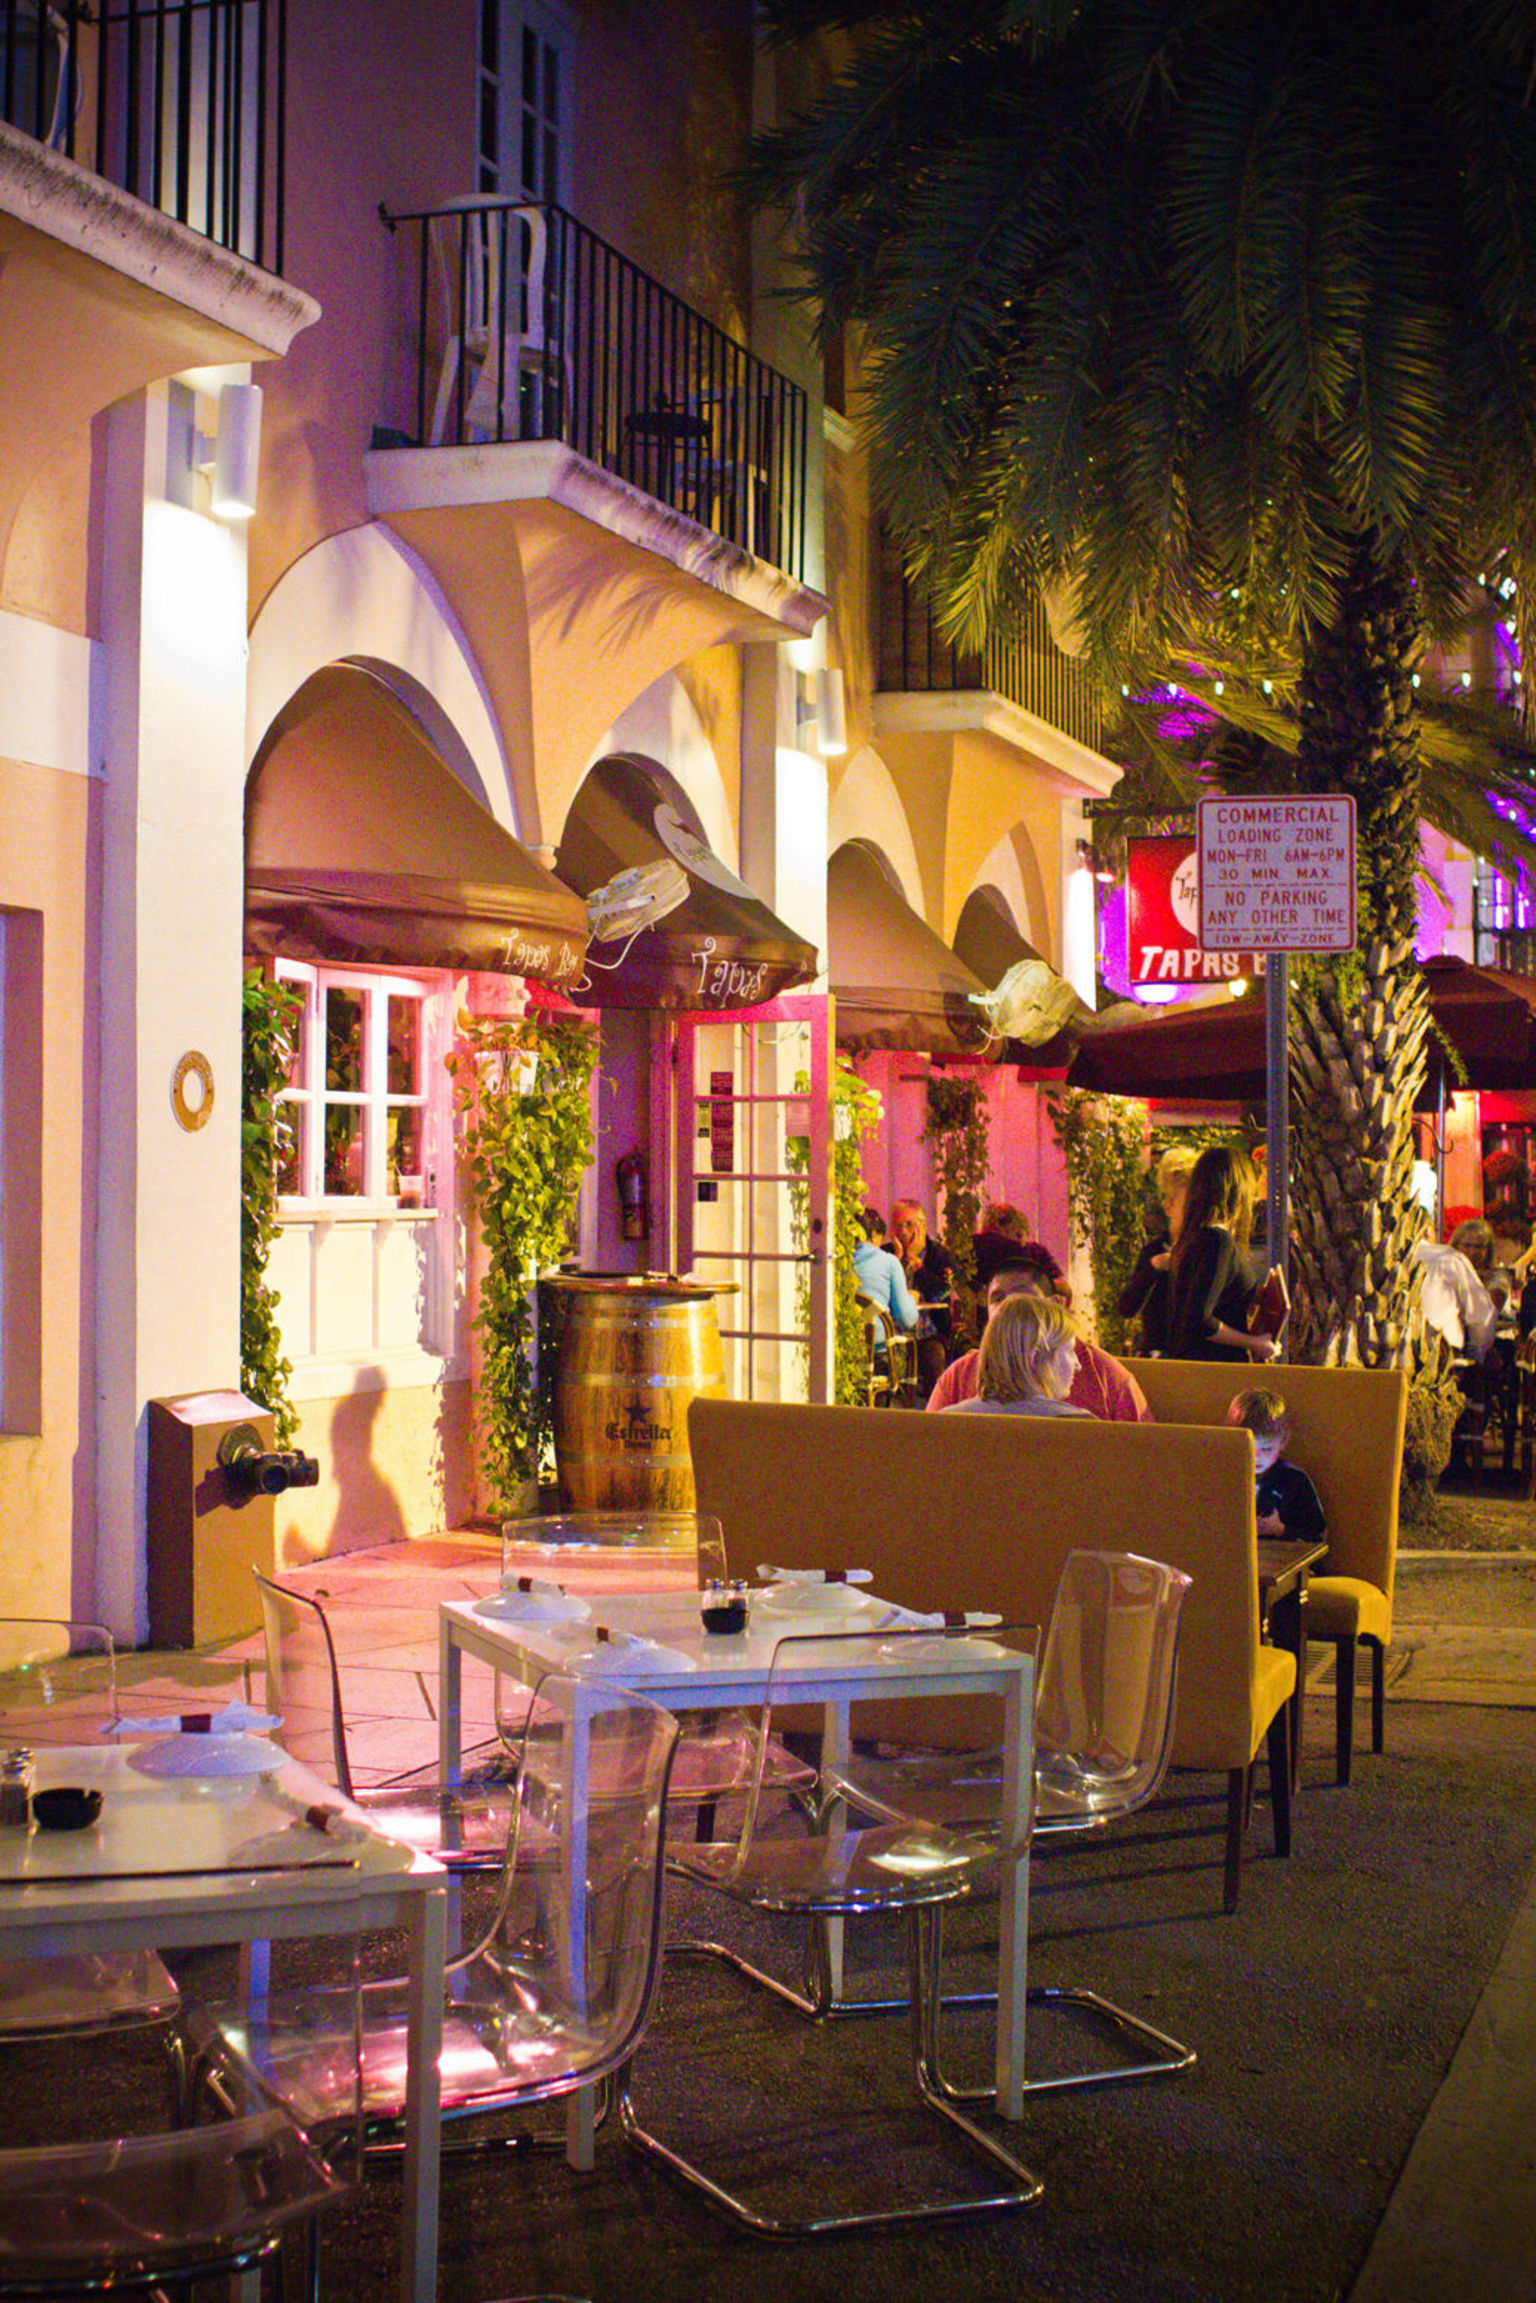 MAIS FOTOS, South Beach Cultural Food and Walking Tour